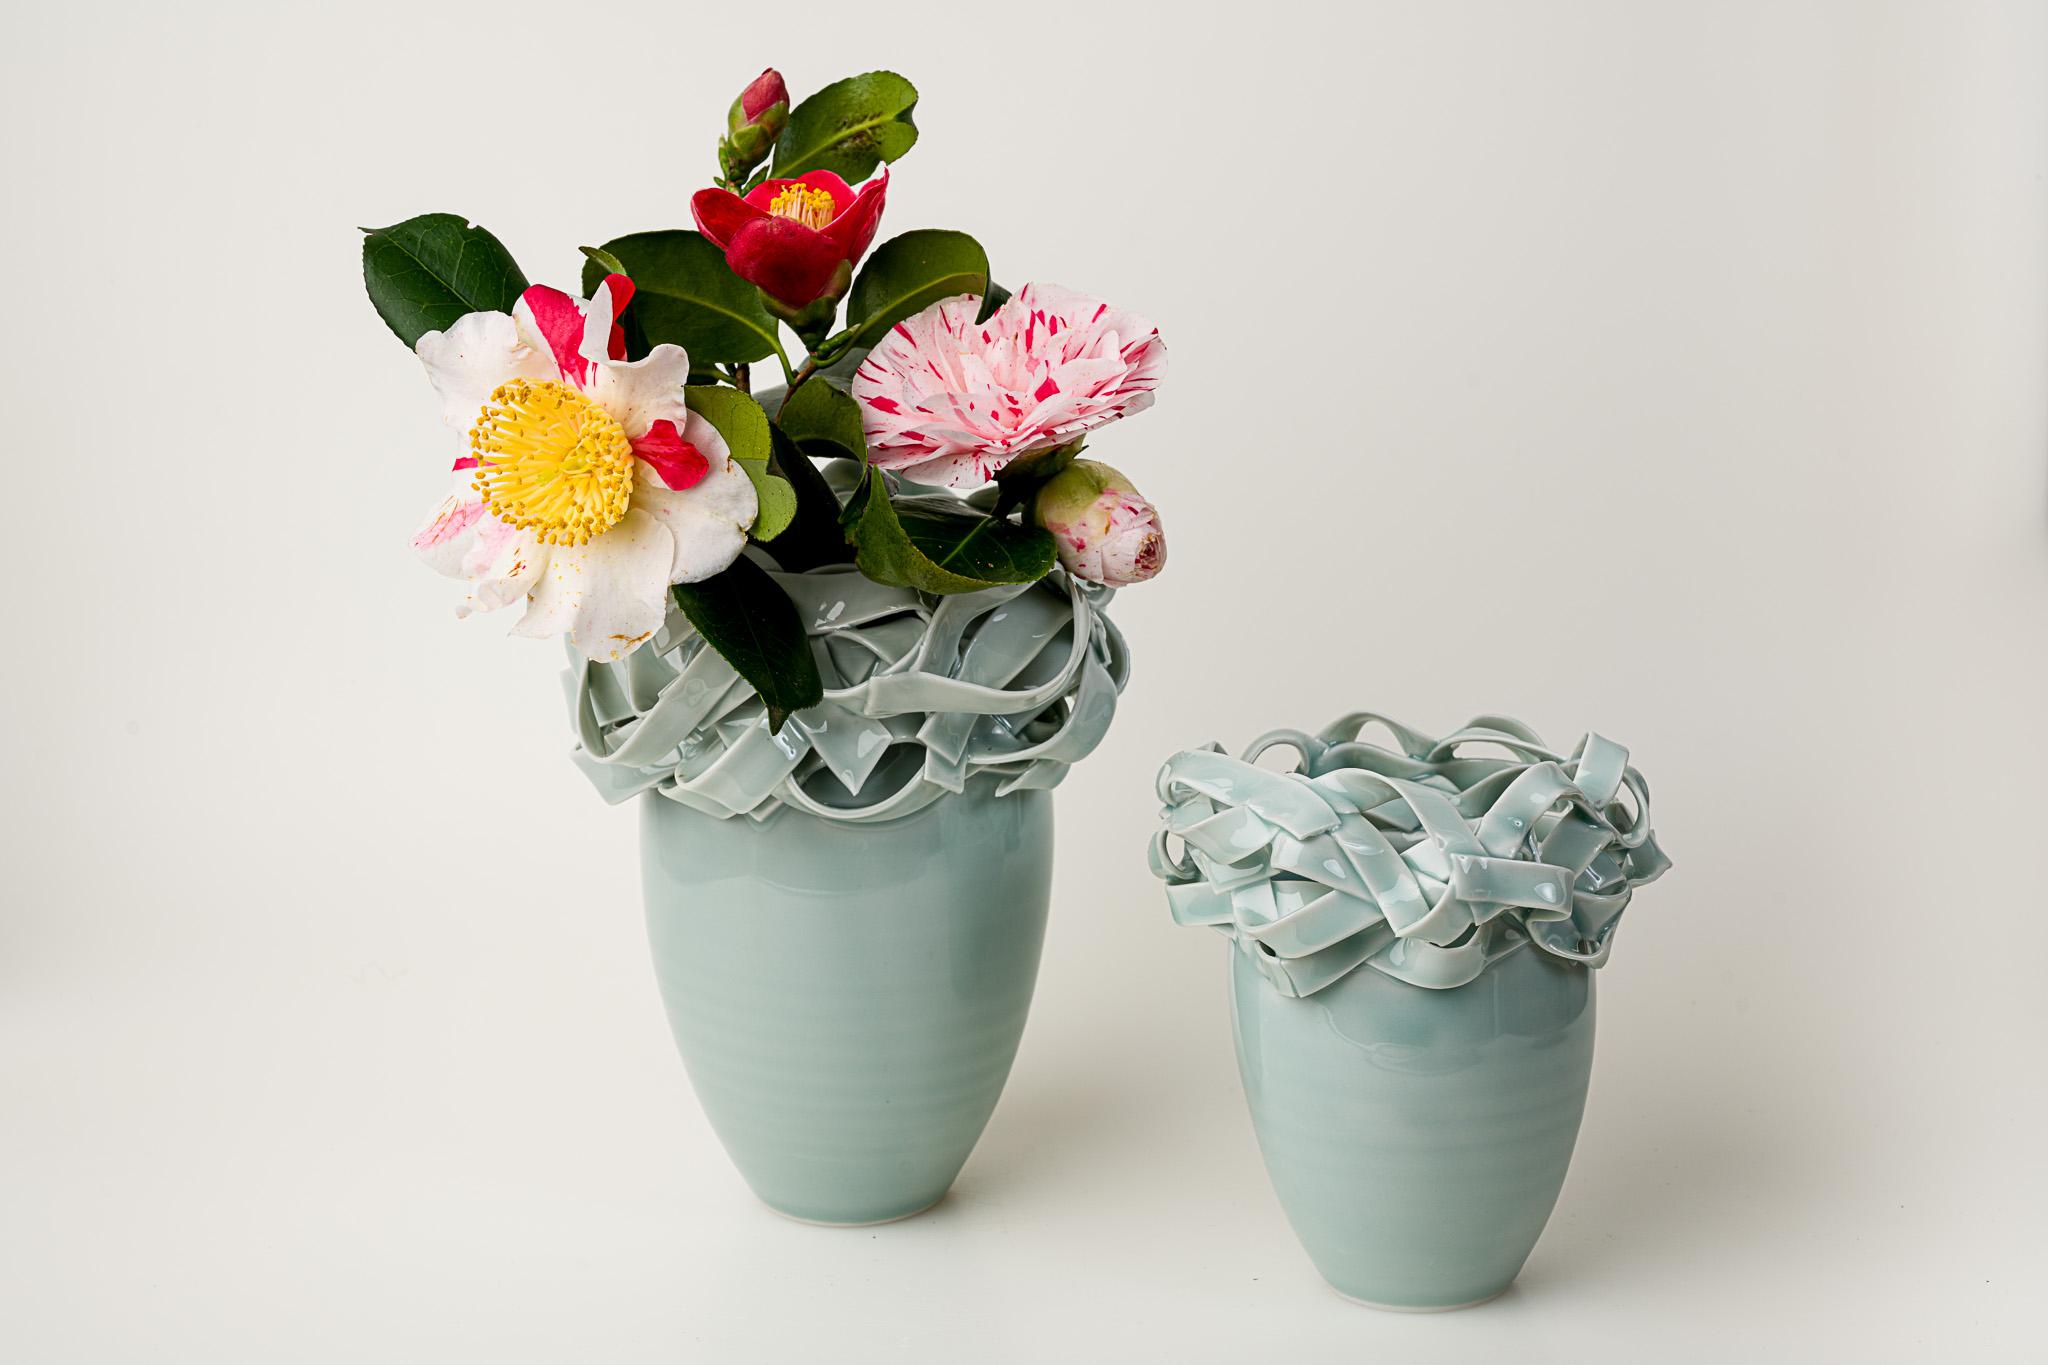 Vasenobjekte Porzellan Seladonglasur groß: Euro 220,00  klein: 100,00